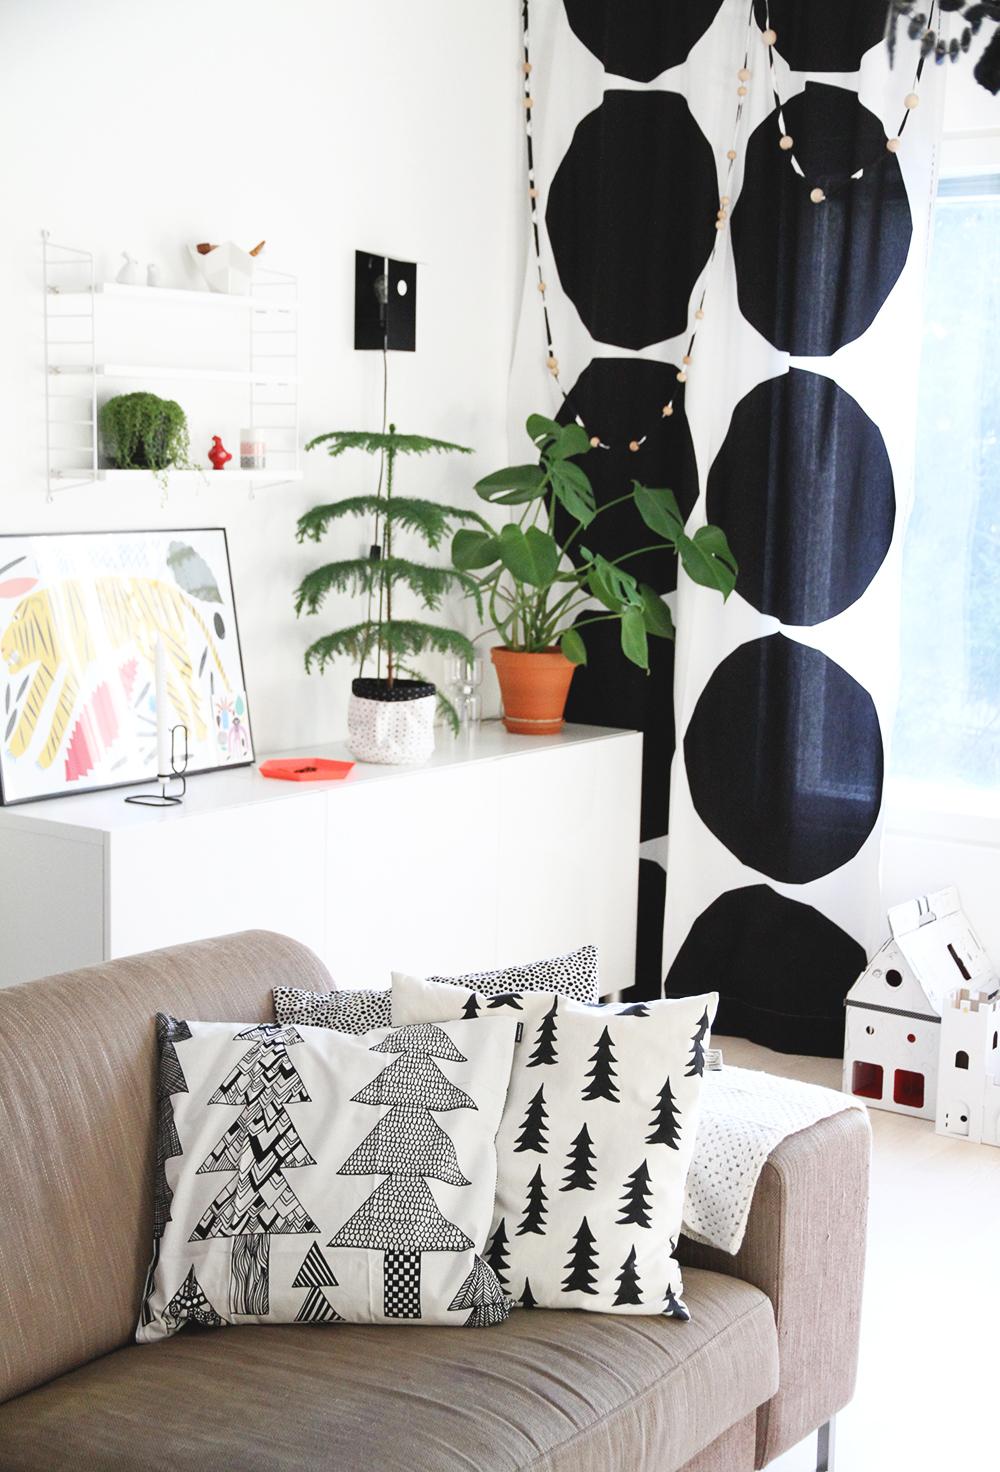 hunajaista sisistusblogi decoration interior finnish home marimekko fine little day balck white string